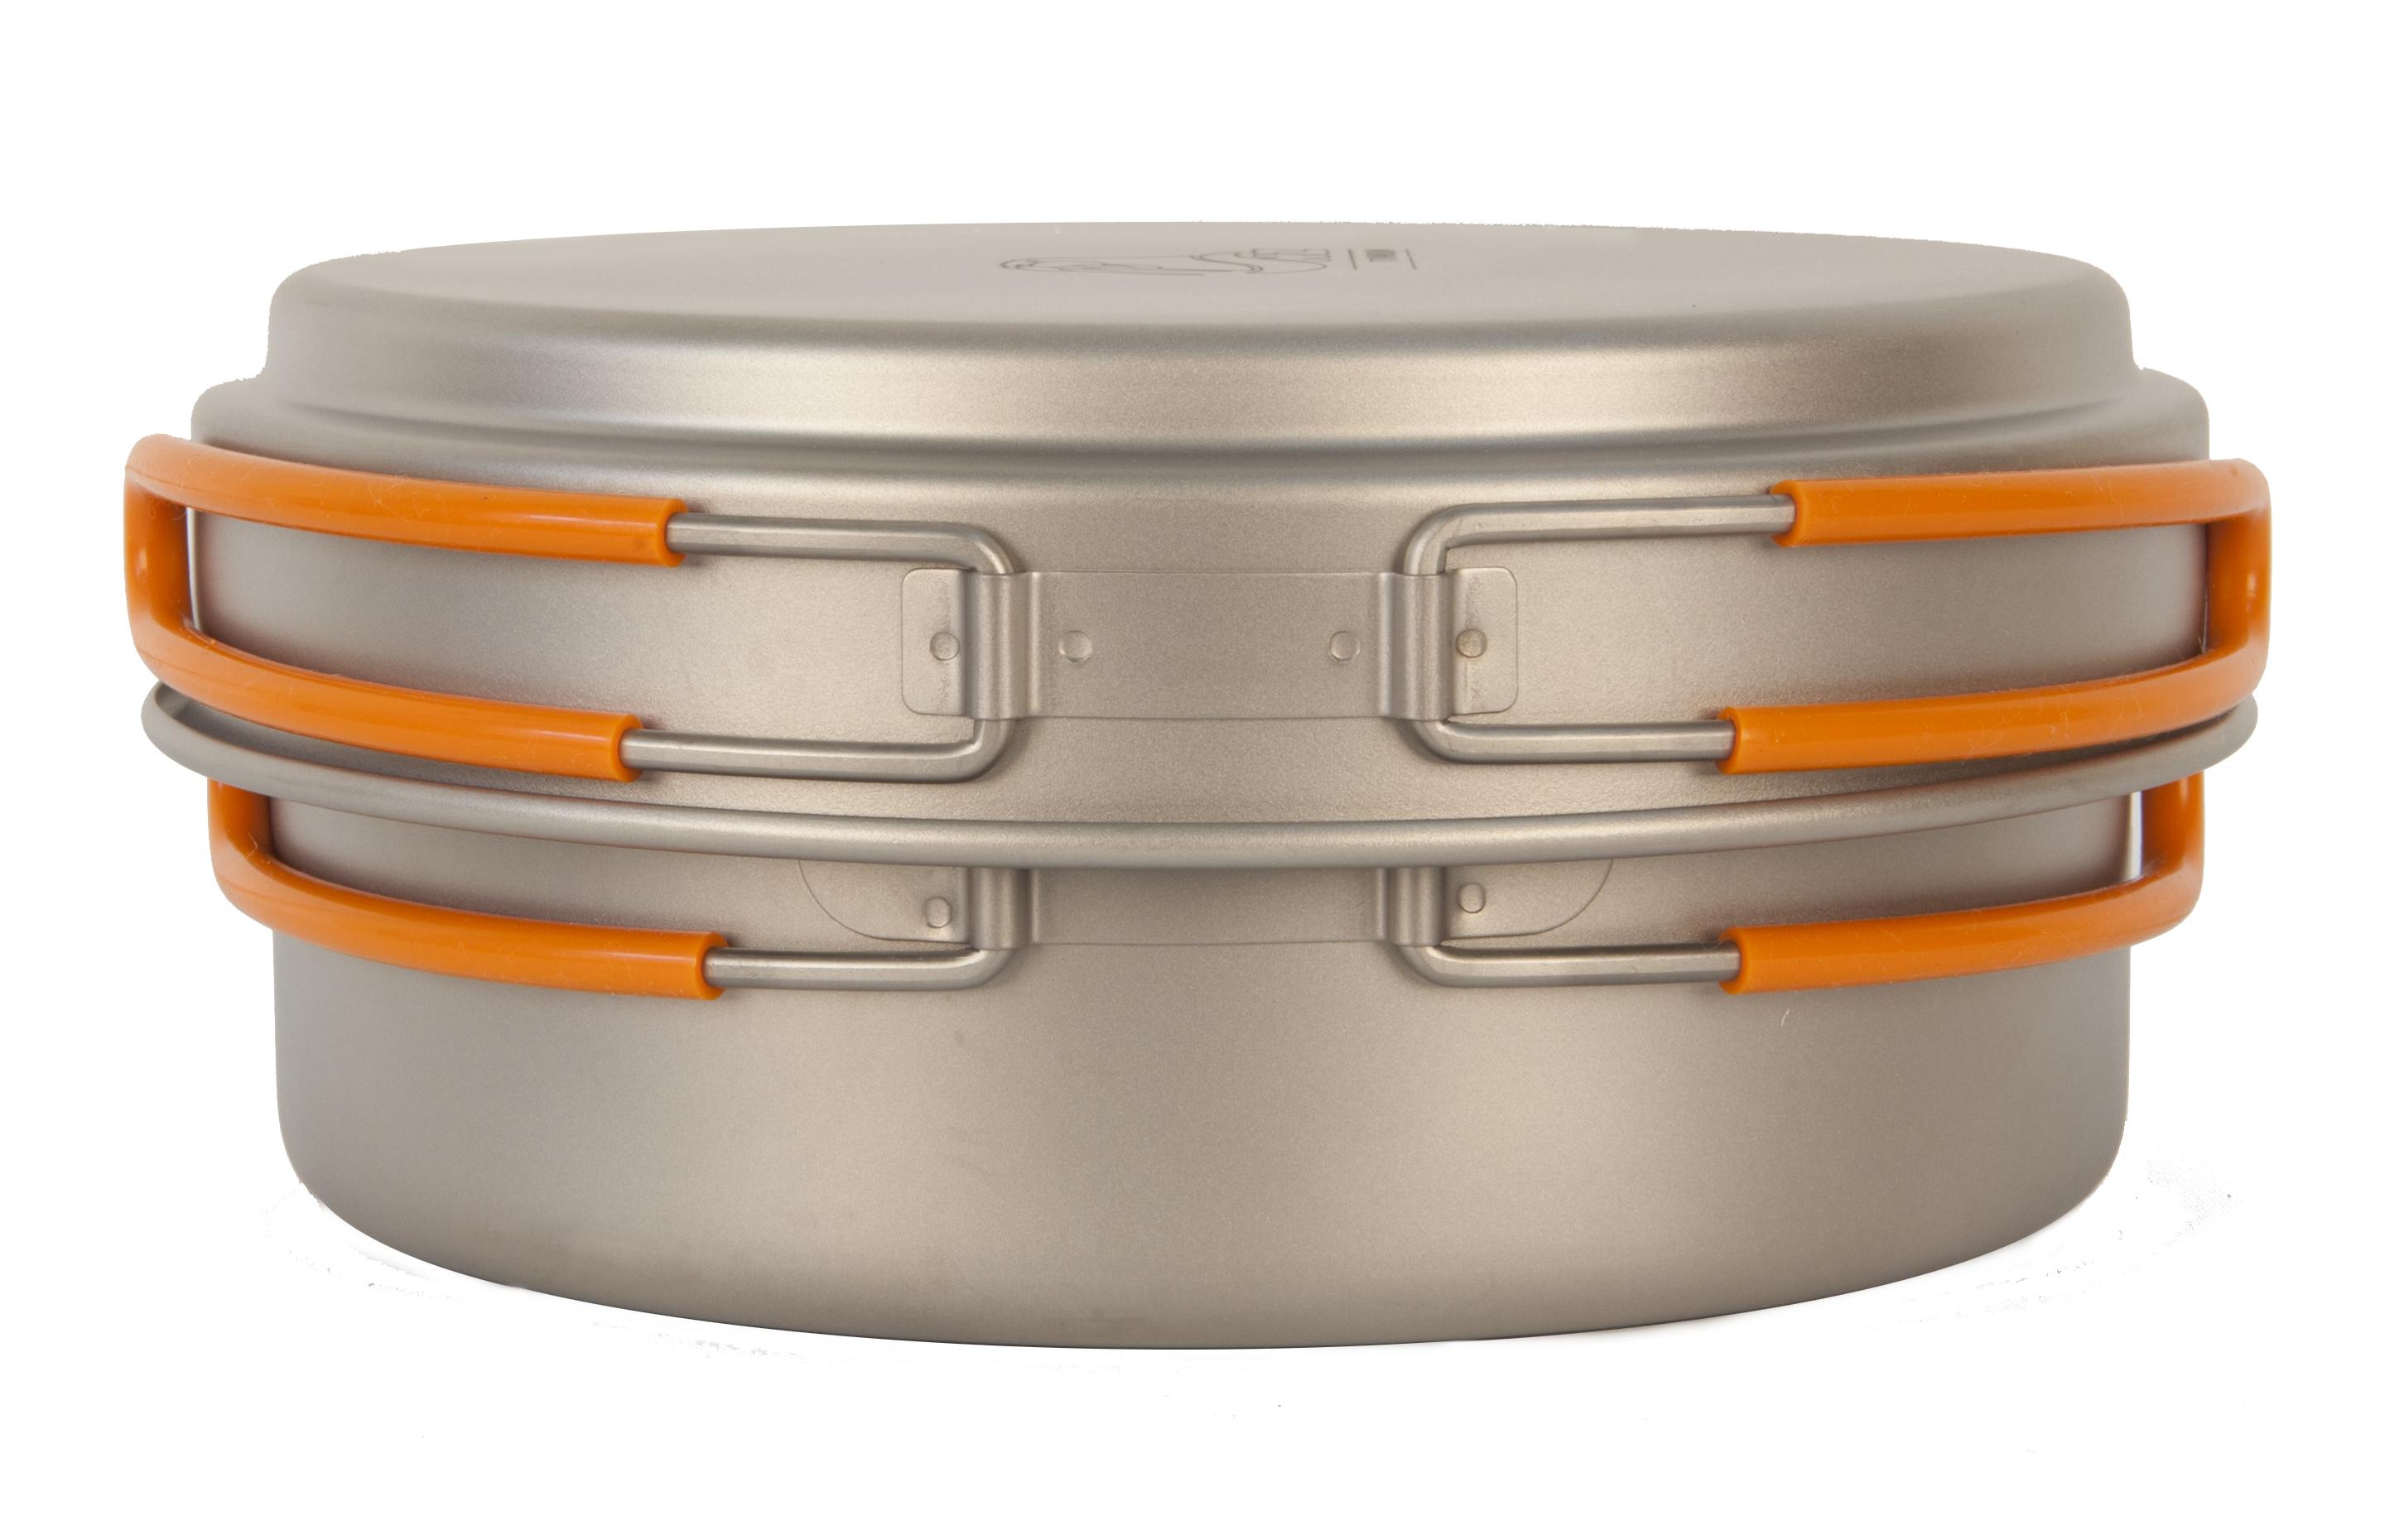 Кастрюля с крышкой 950 мл NZ Ti Cookware 950 ml фото